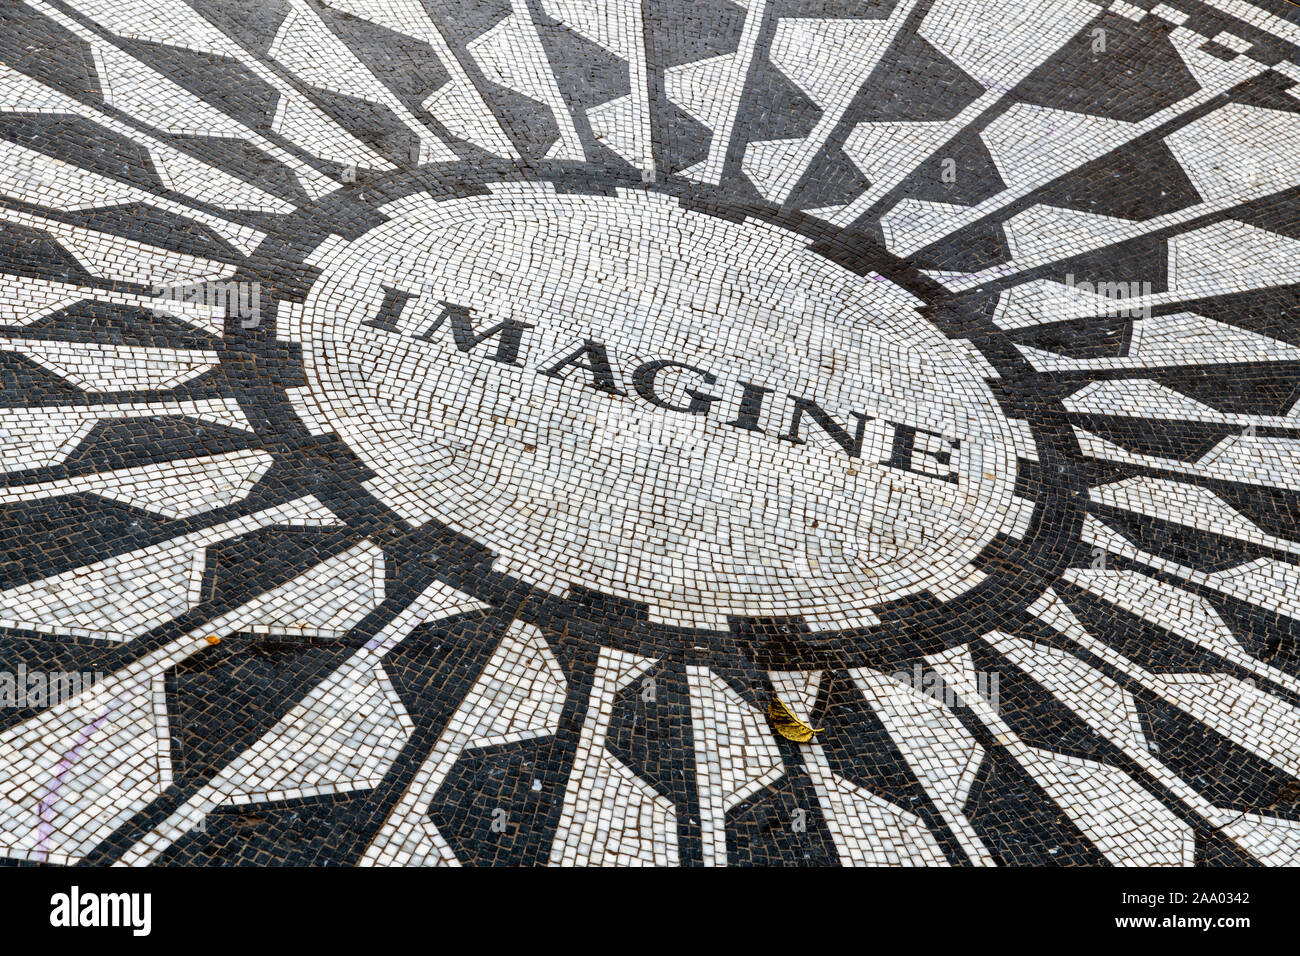 Imagine ruta circular mosaico, Strawberry Fields memorial, Central Park, Manhattan, Nueva York, EE.UU. Foto de stock